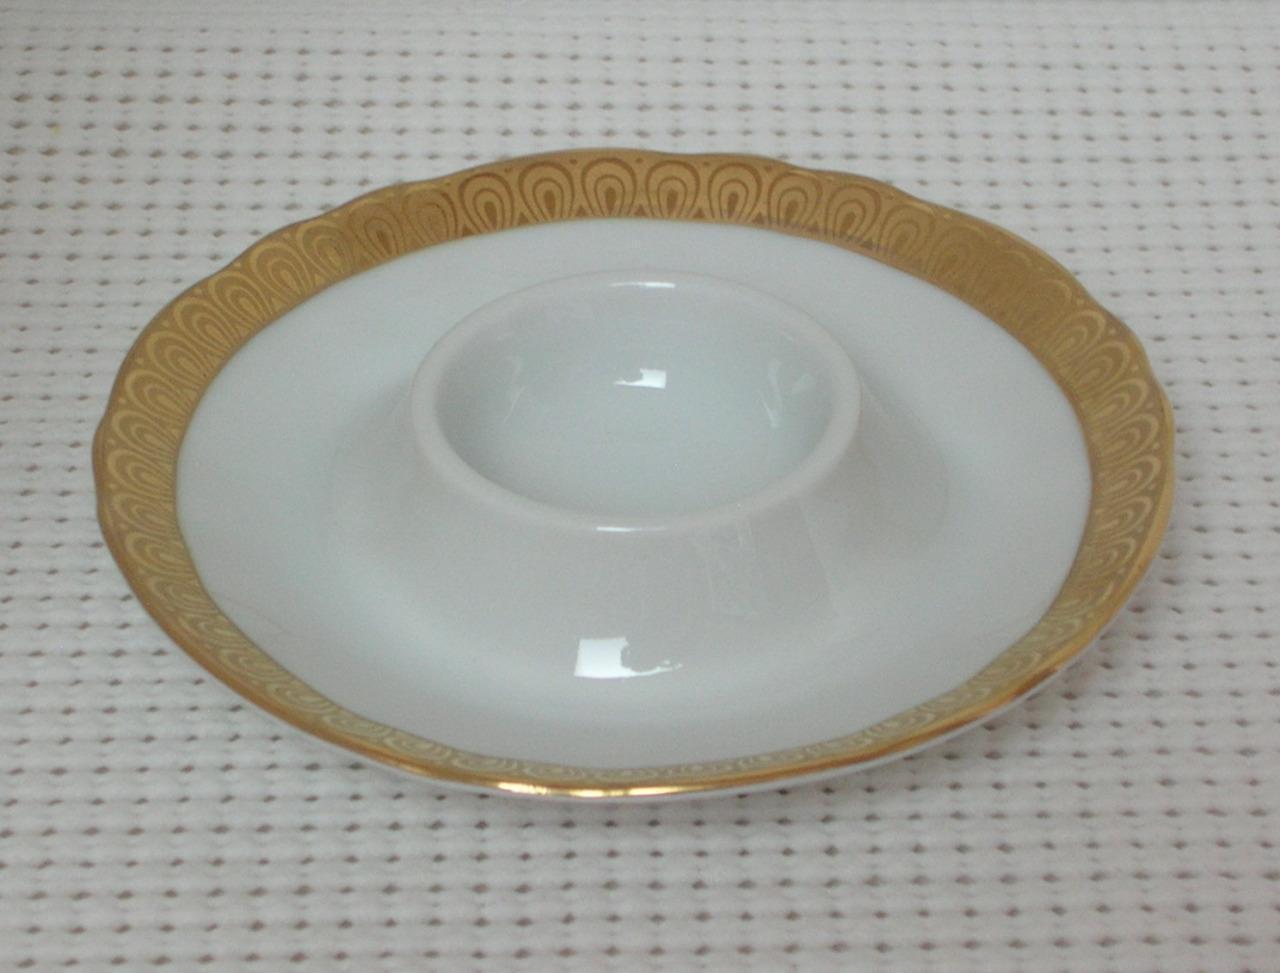 WINTERLING BAVARIA FLAT SINGLE EGG CUP Bone China MARKTLEUTHEN Germany Gold - $6.97